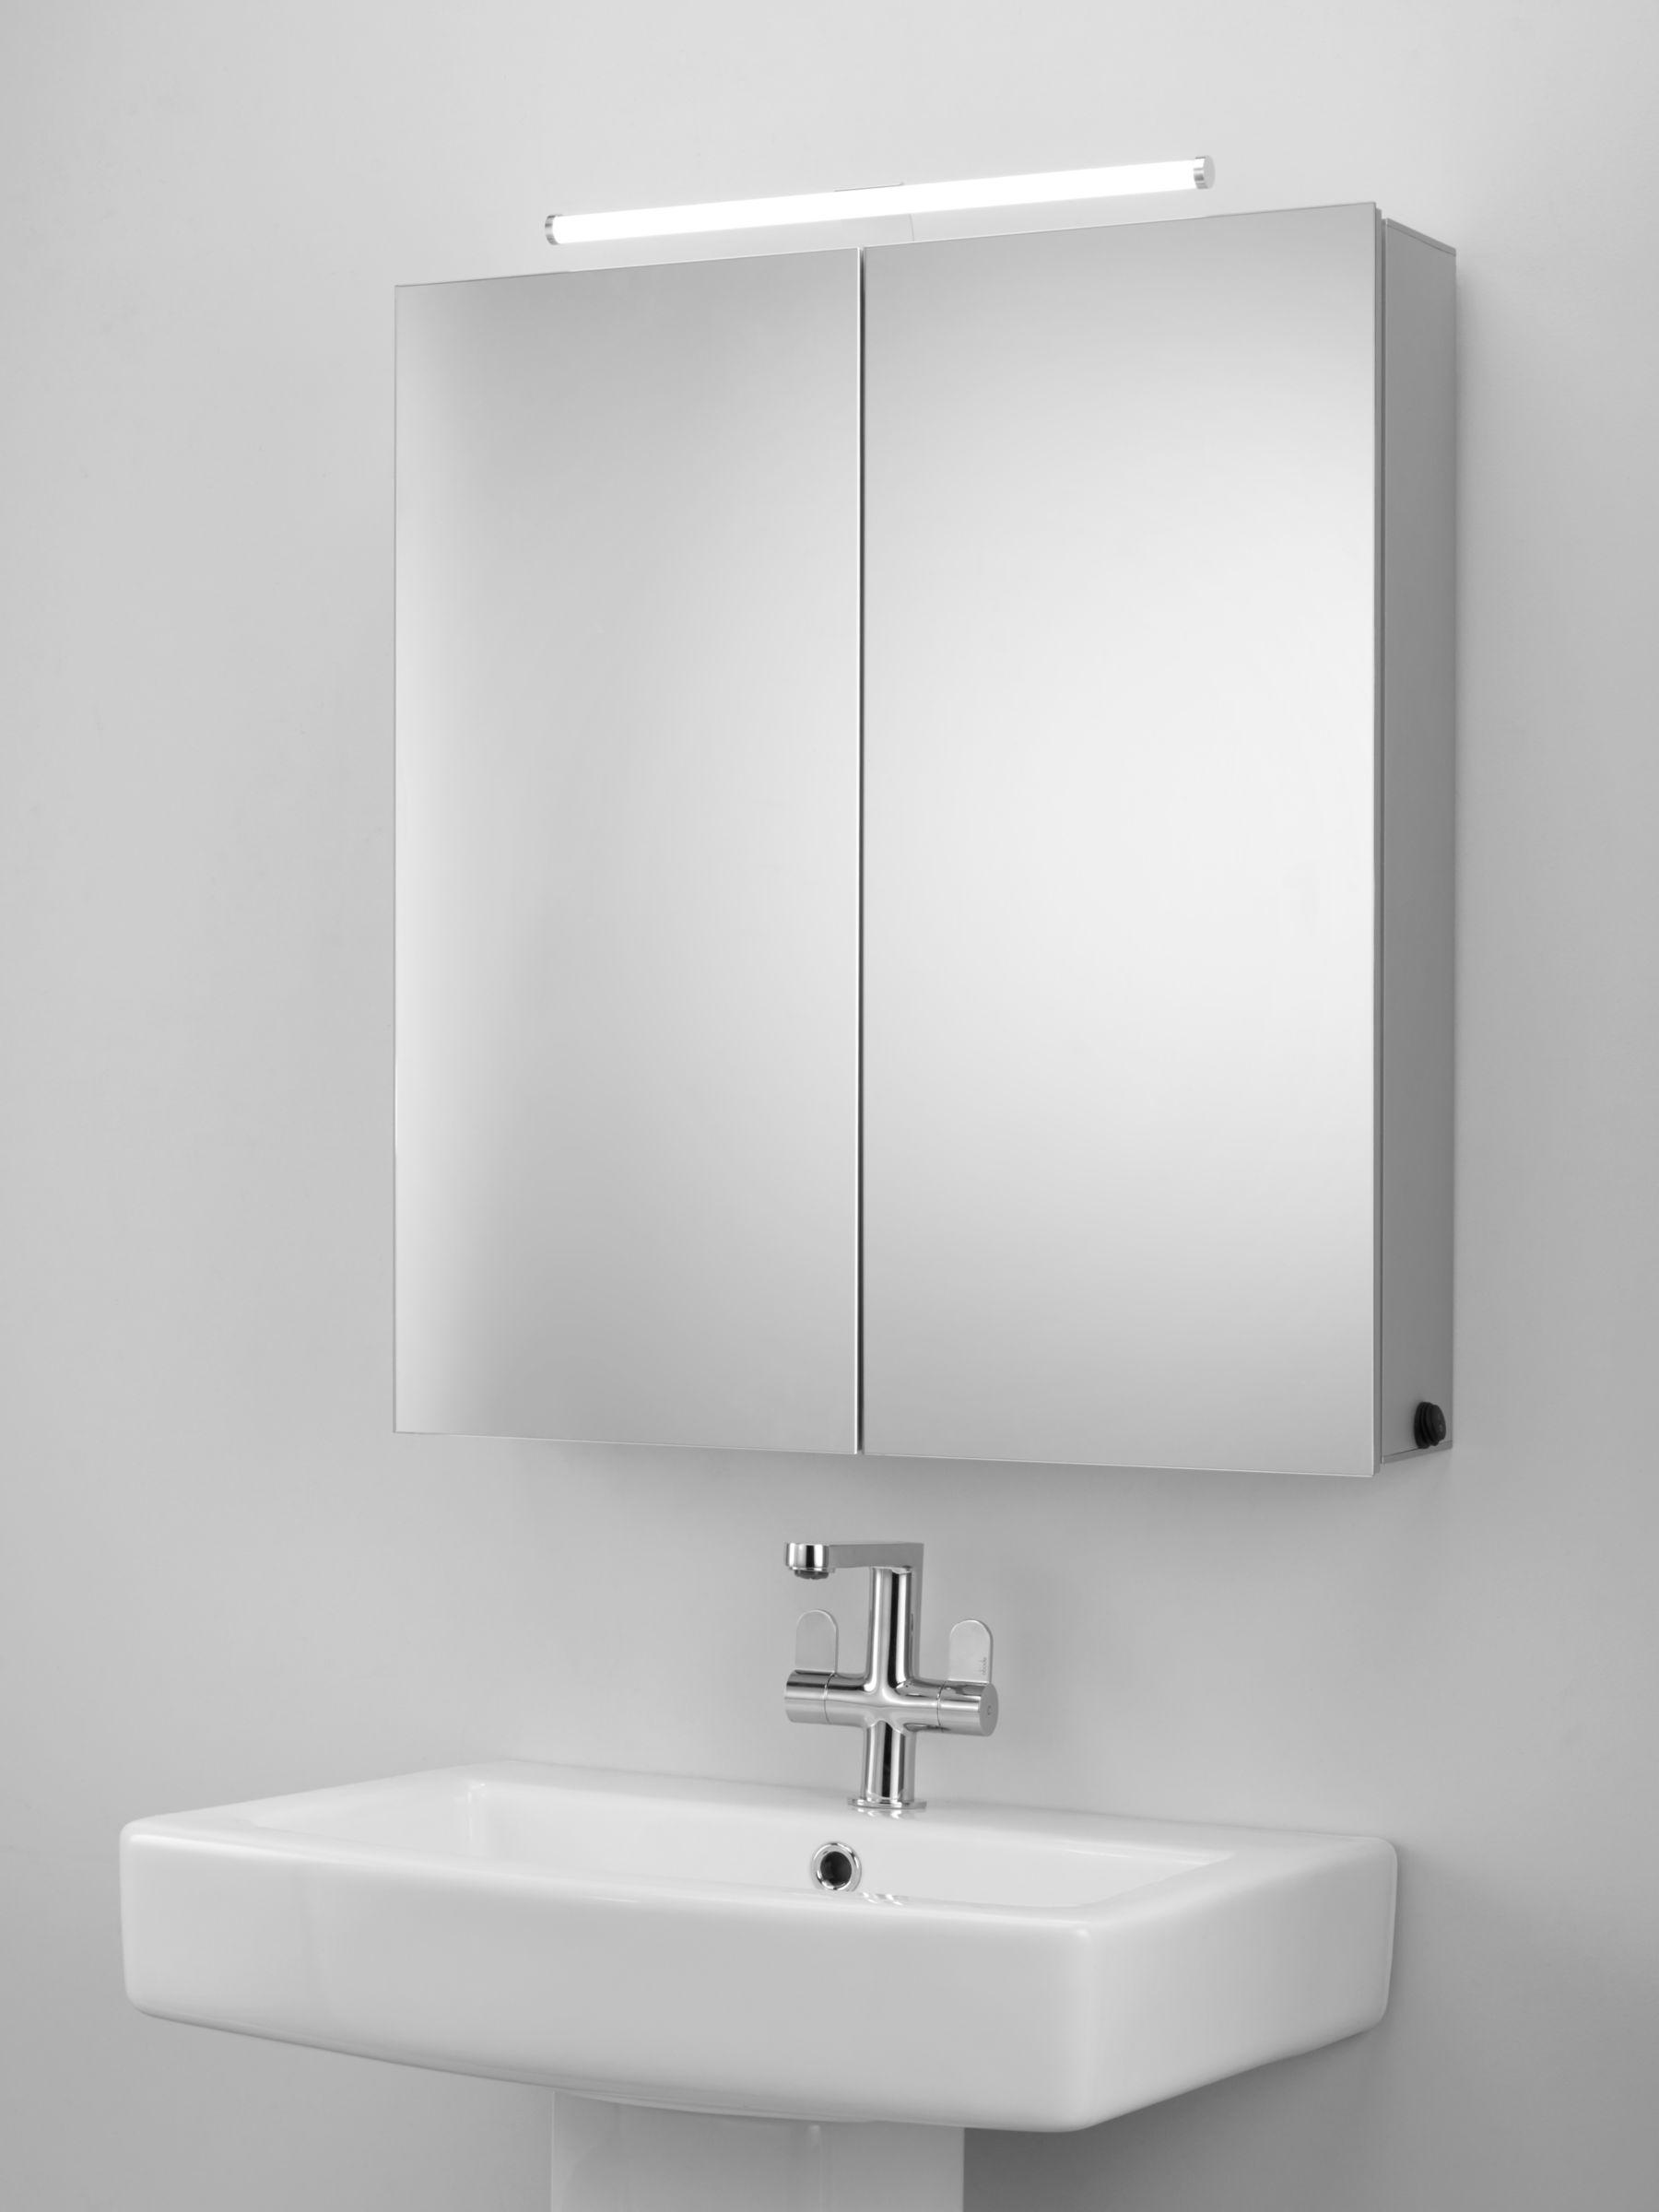 John Lewis & Partners Debut Double Mirrored Illuminated Bathroom ...